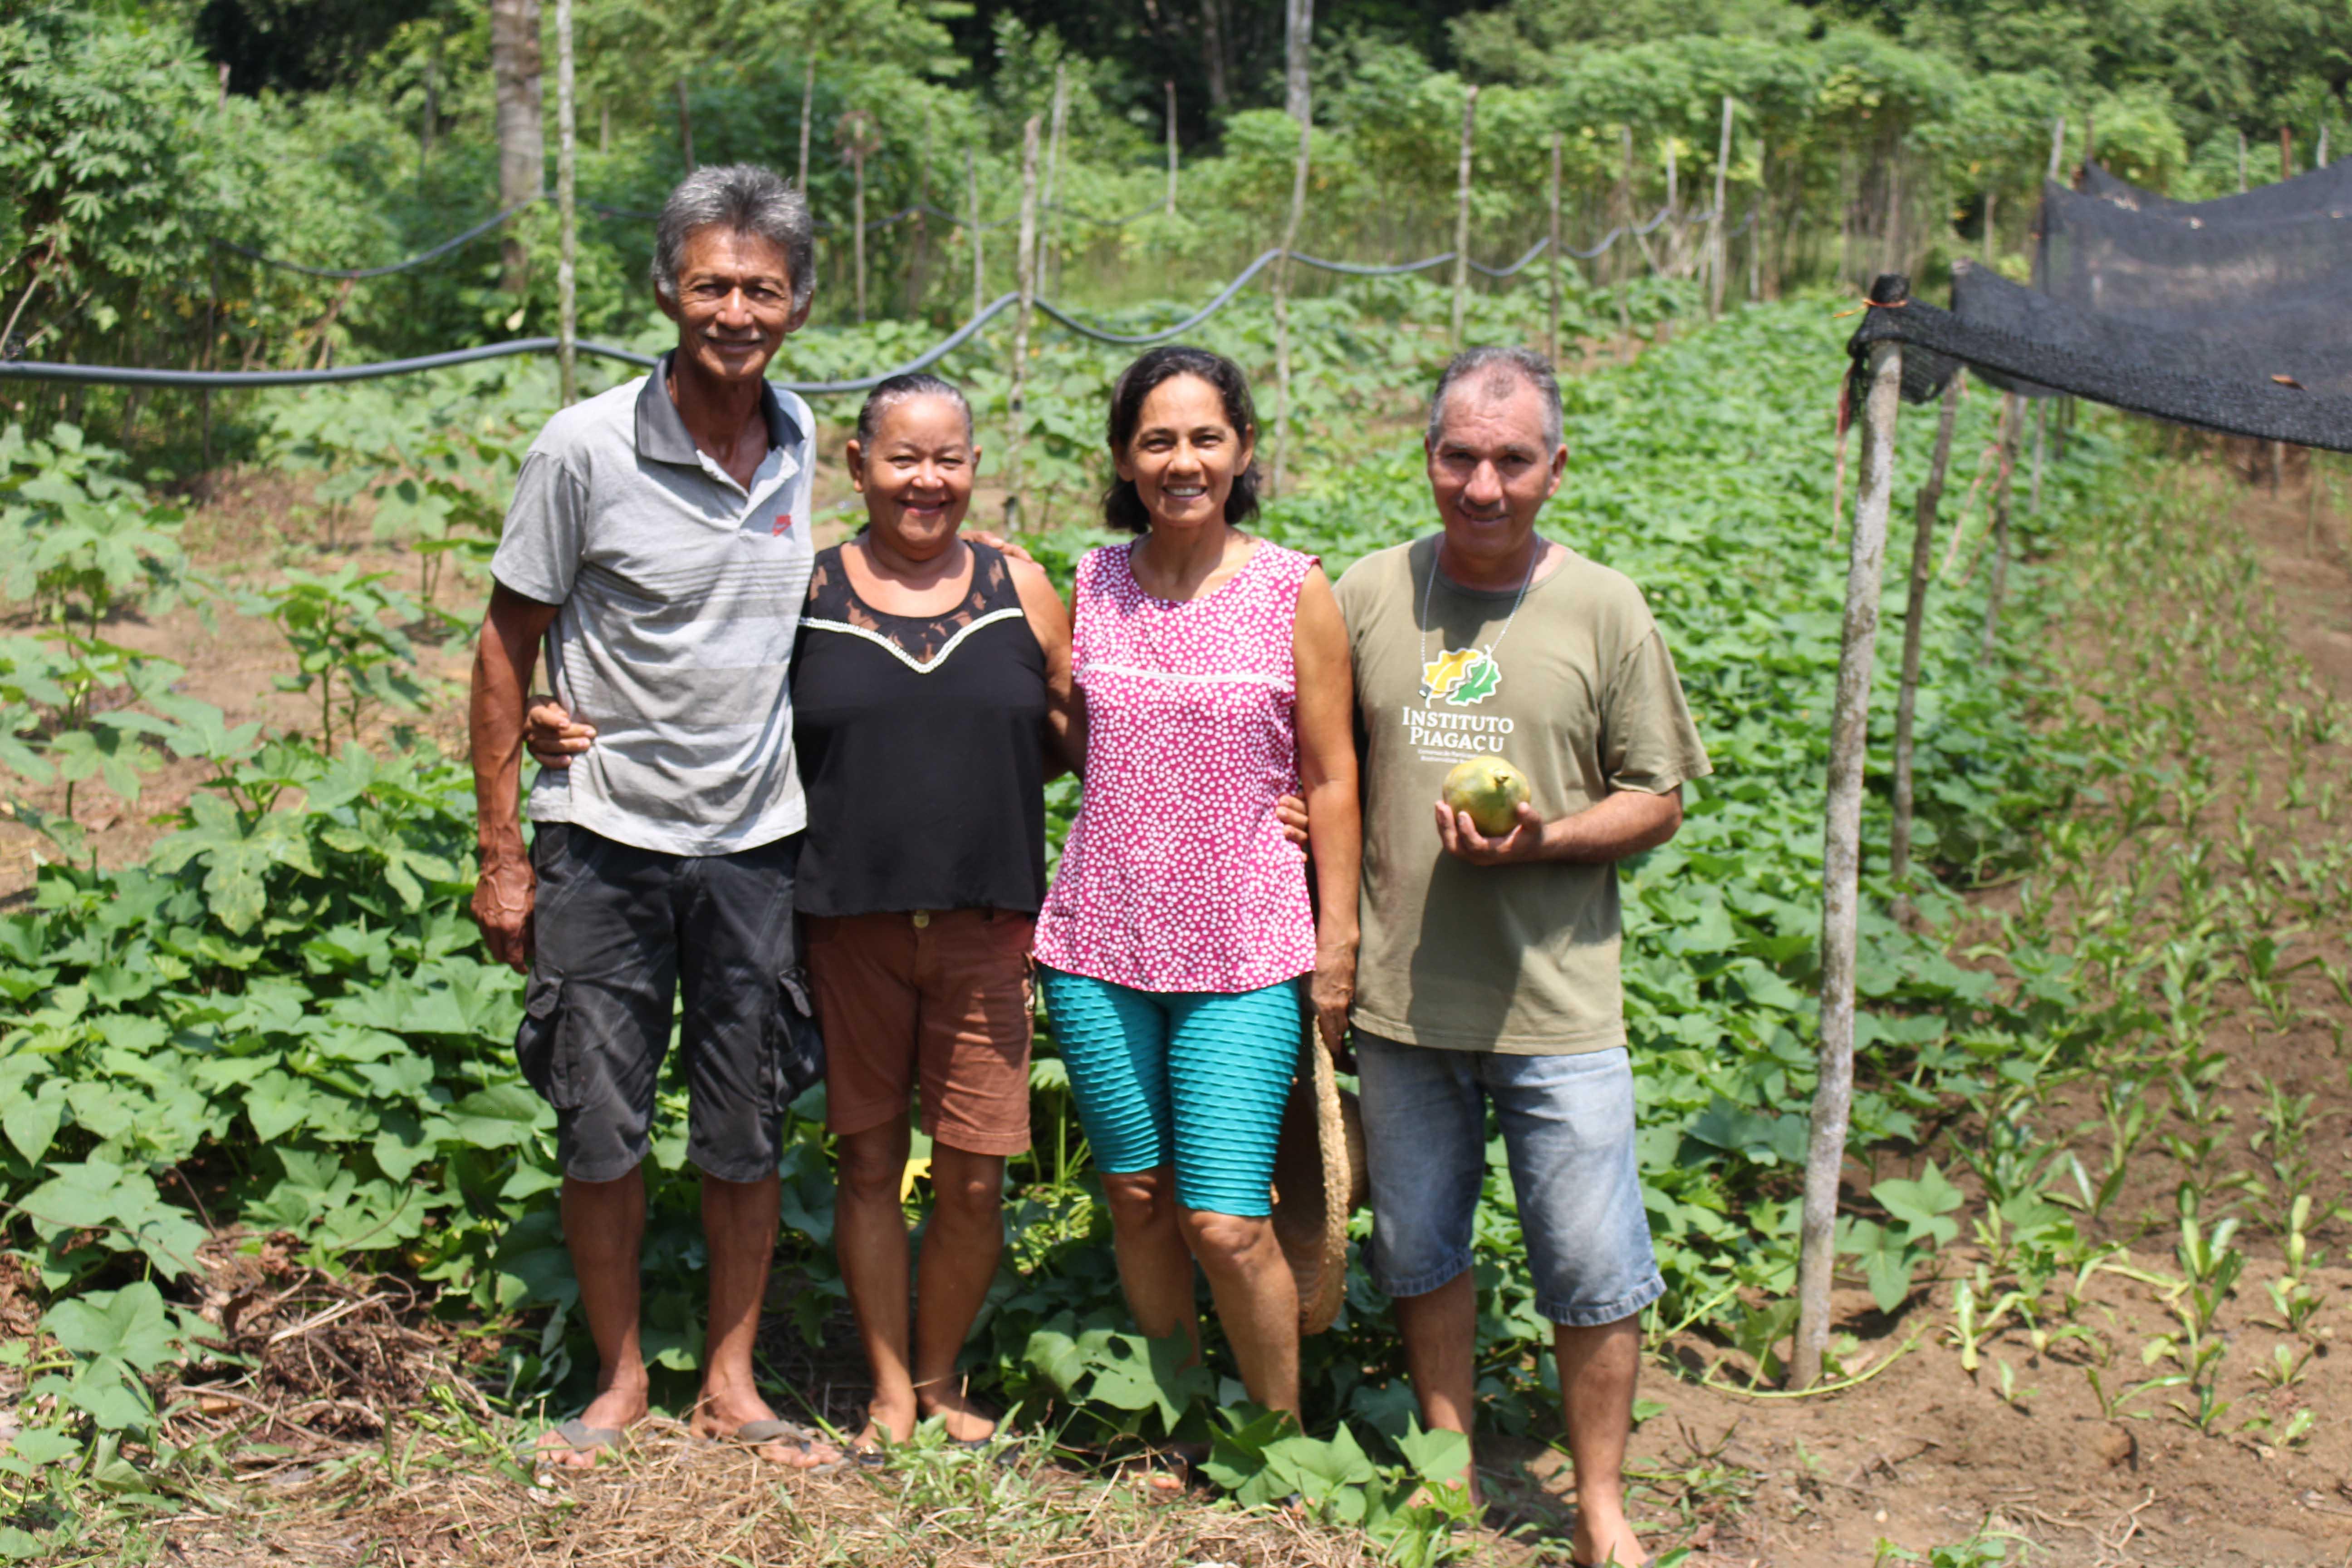 Apoi Iranduba agricultura sustentável BrazilFoundation manaus amazonas amazônia